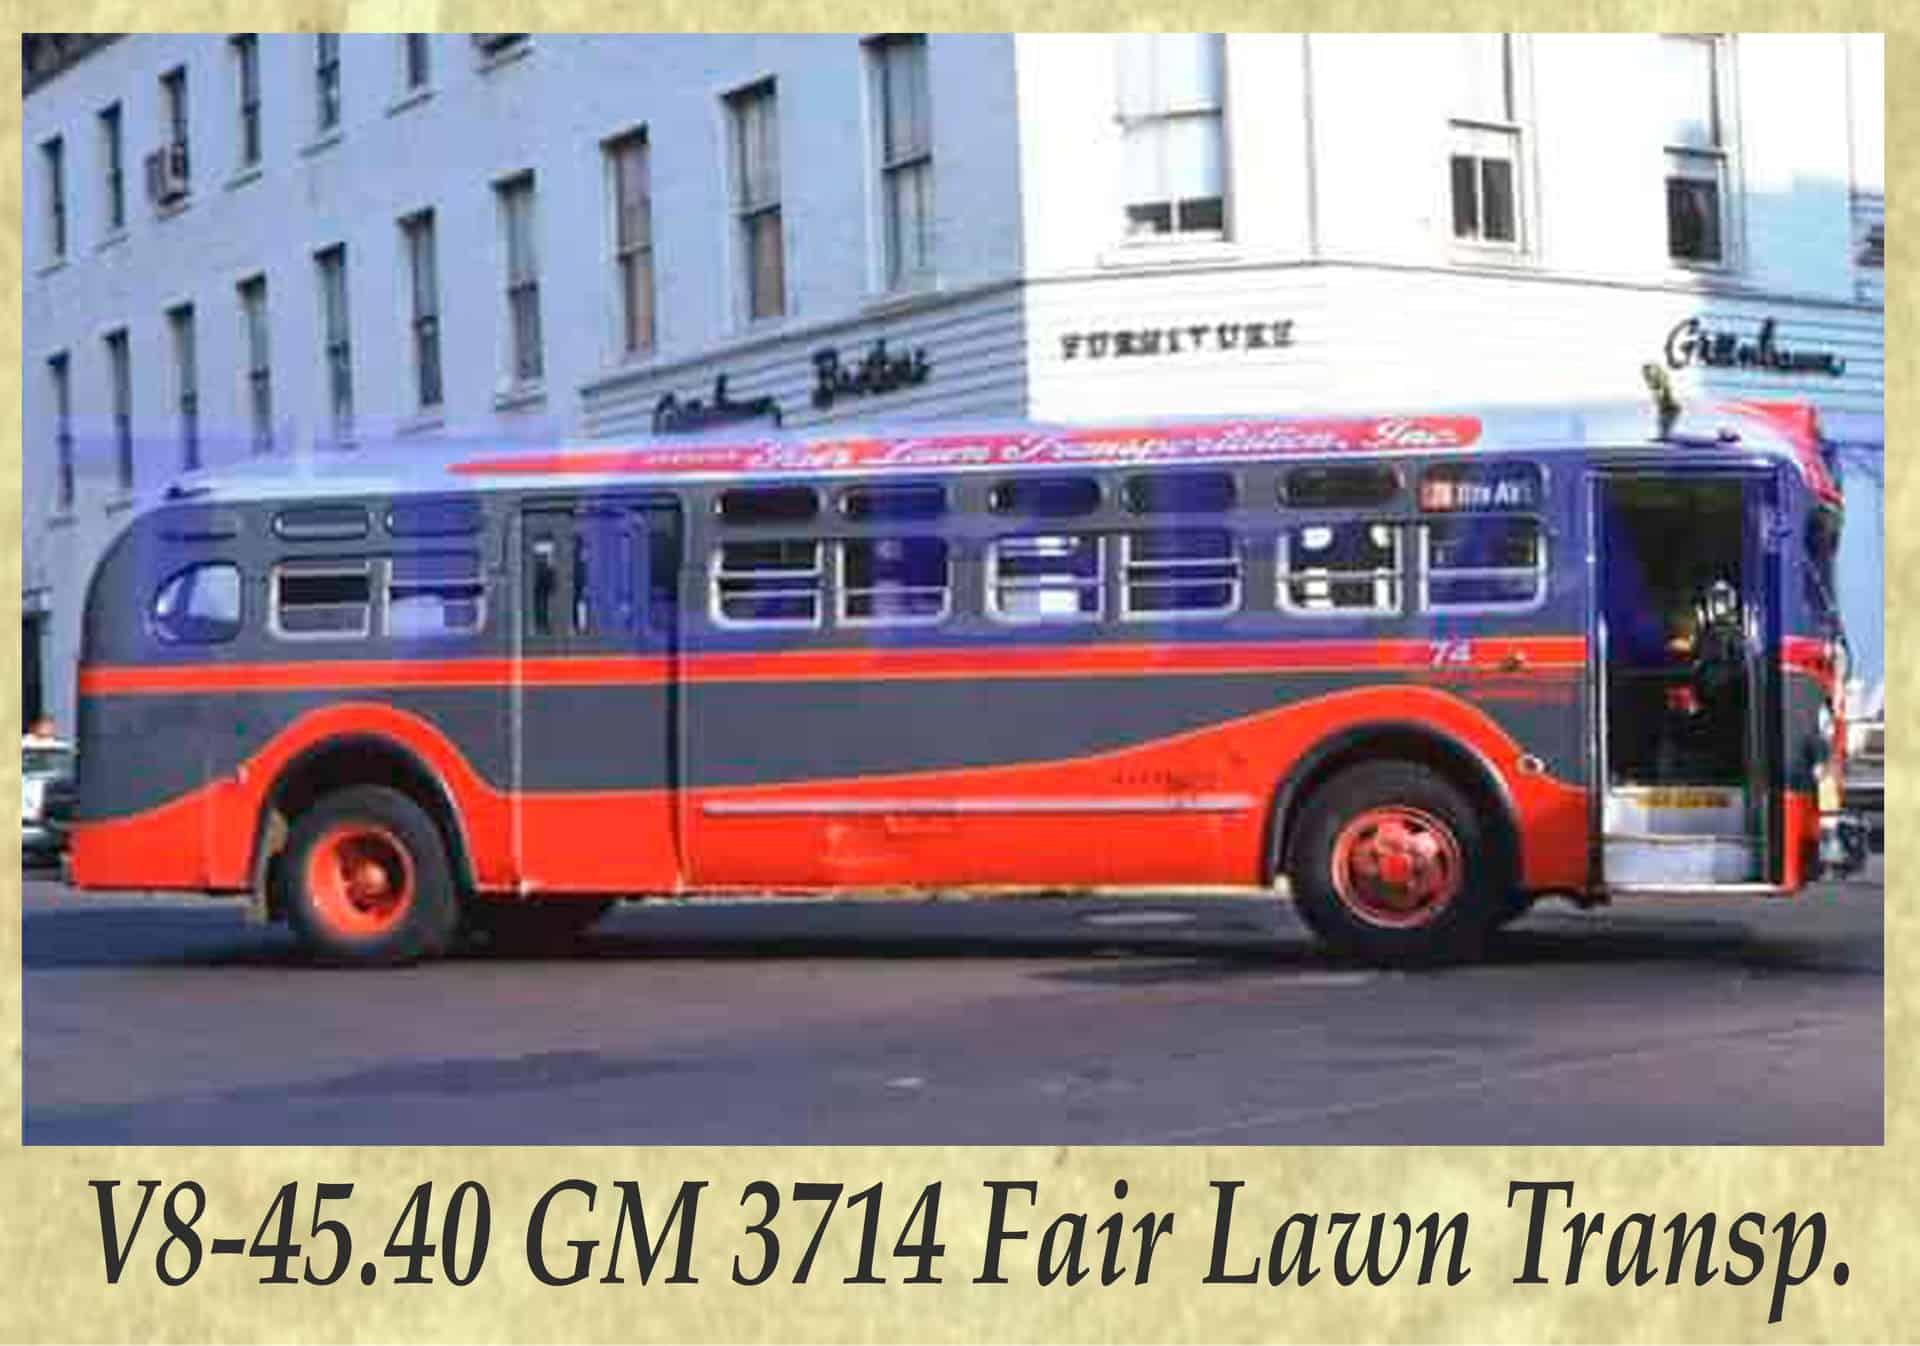 V8-45.40 GM 3714 Fair Lawn Transp.